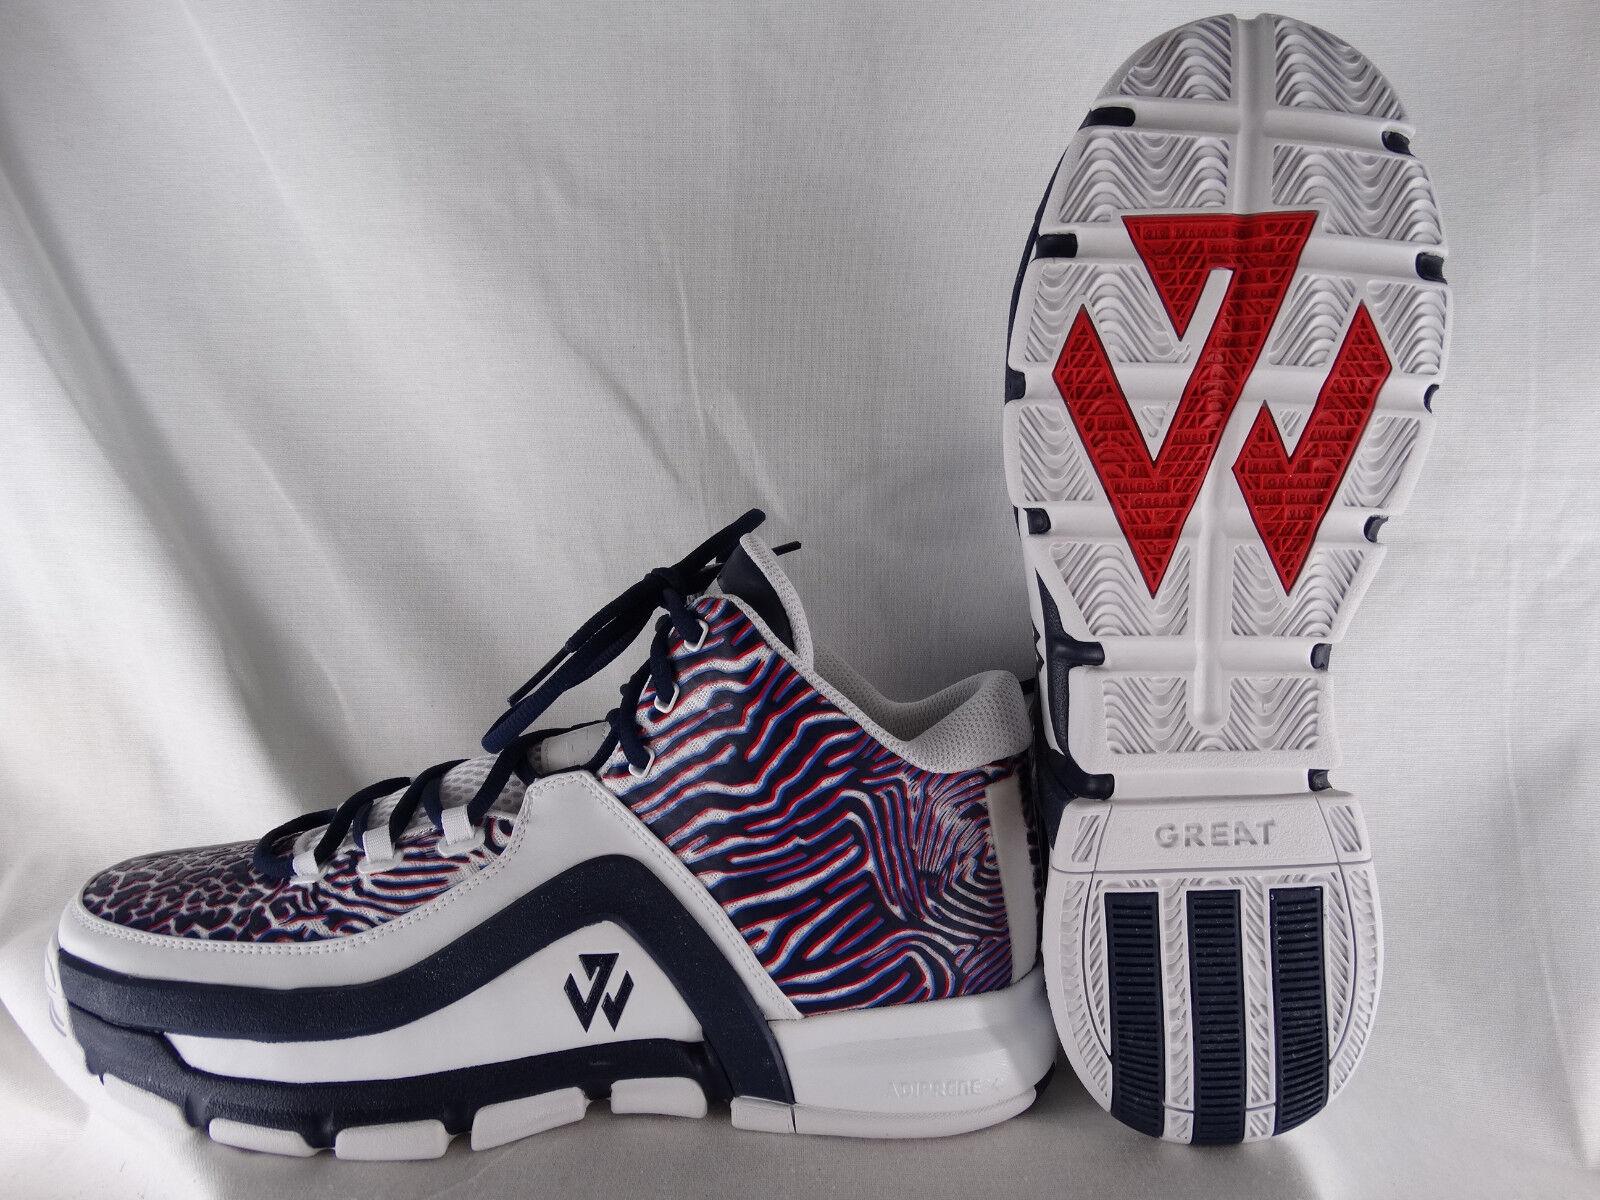 Adidas John Wall 2 Basketballschuhe F37310 weiß-blau-rot EU 48 UK 12,5